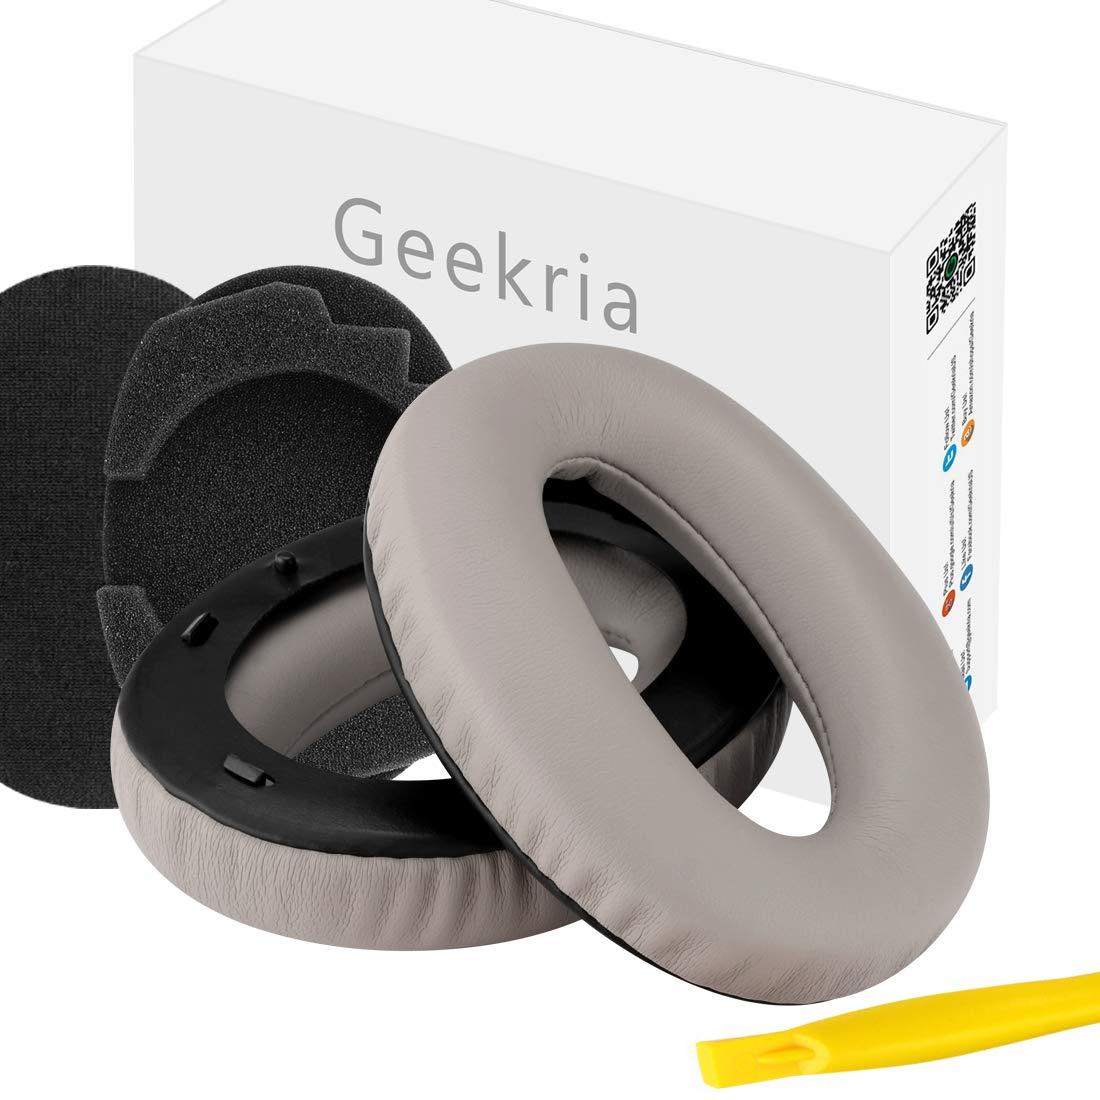 Almohadillas Para Auriculares Sony Wh1000xm2 Mdr-1000 [geekria-7svyg6xf]